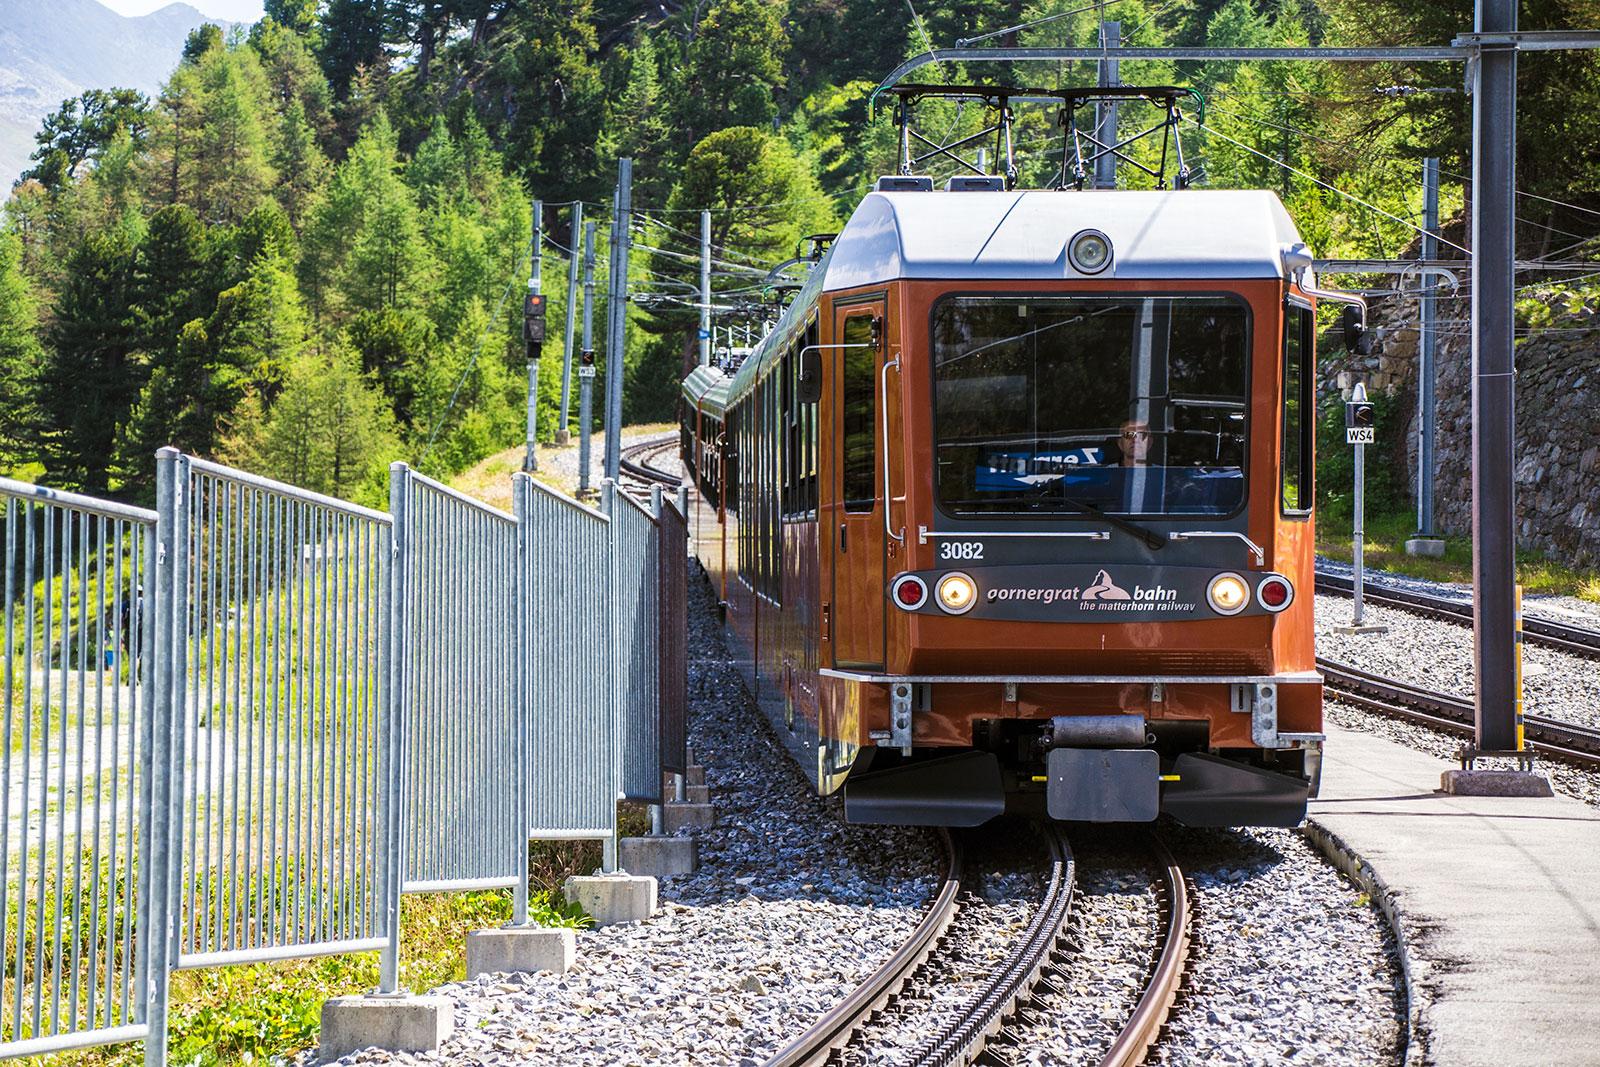 Tren cremallera Gornergratt – Zermatt en dos días